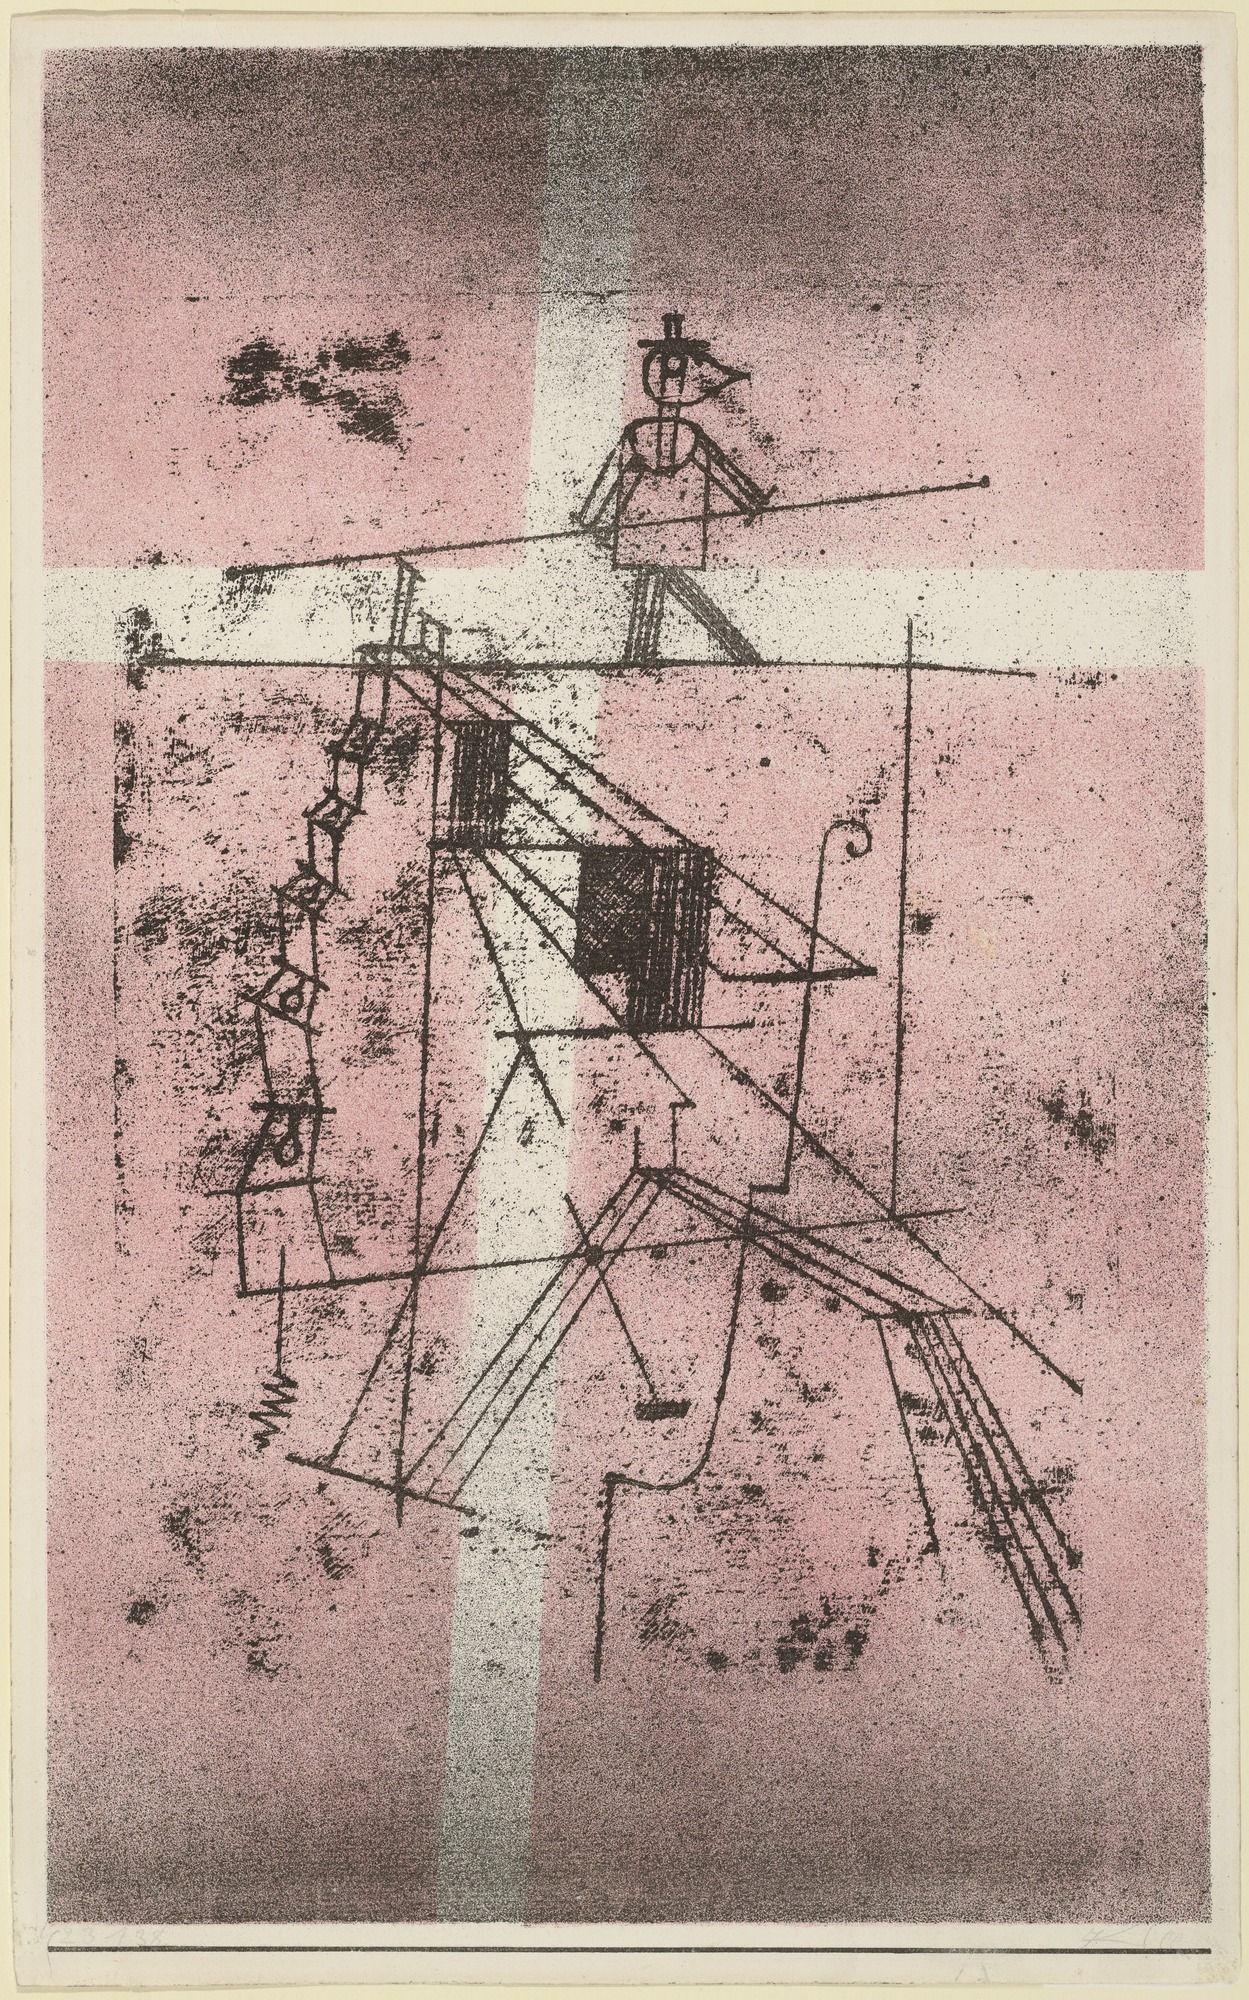 Framed Paul Klee Tightrope Walker Giclee Canvas Print Paintings Poster